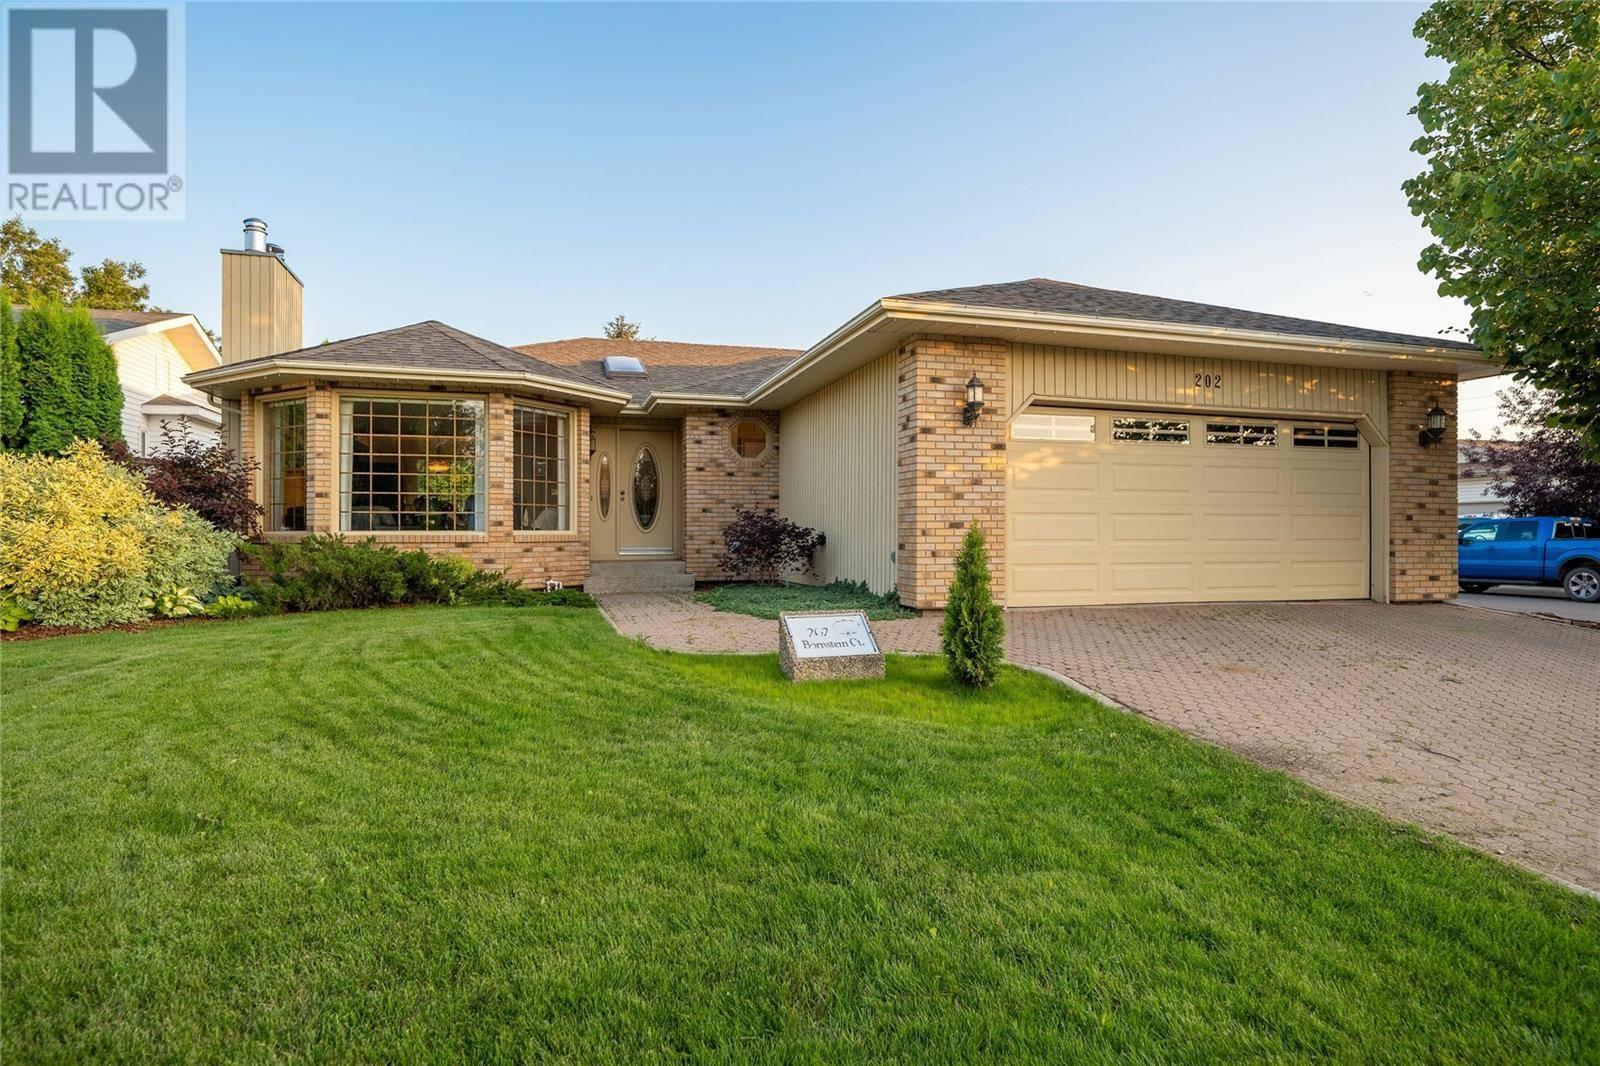 House for sale at 202 Bornstein Ct Saskatoon Saskatchewan - MLS: SK788860